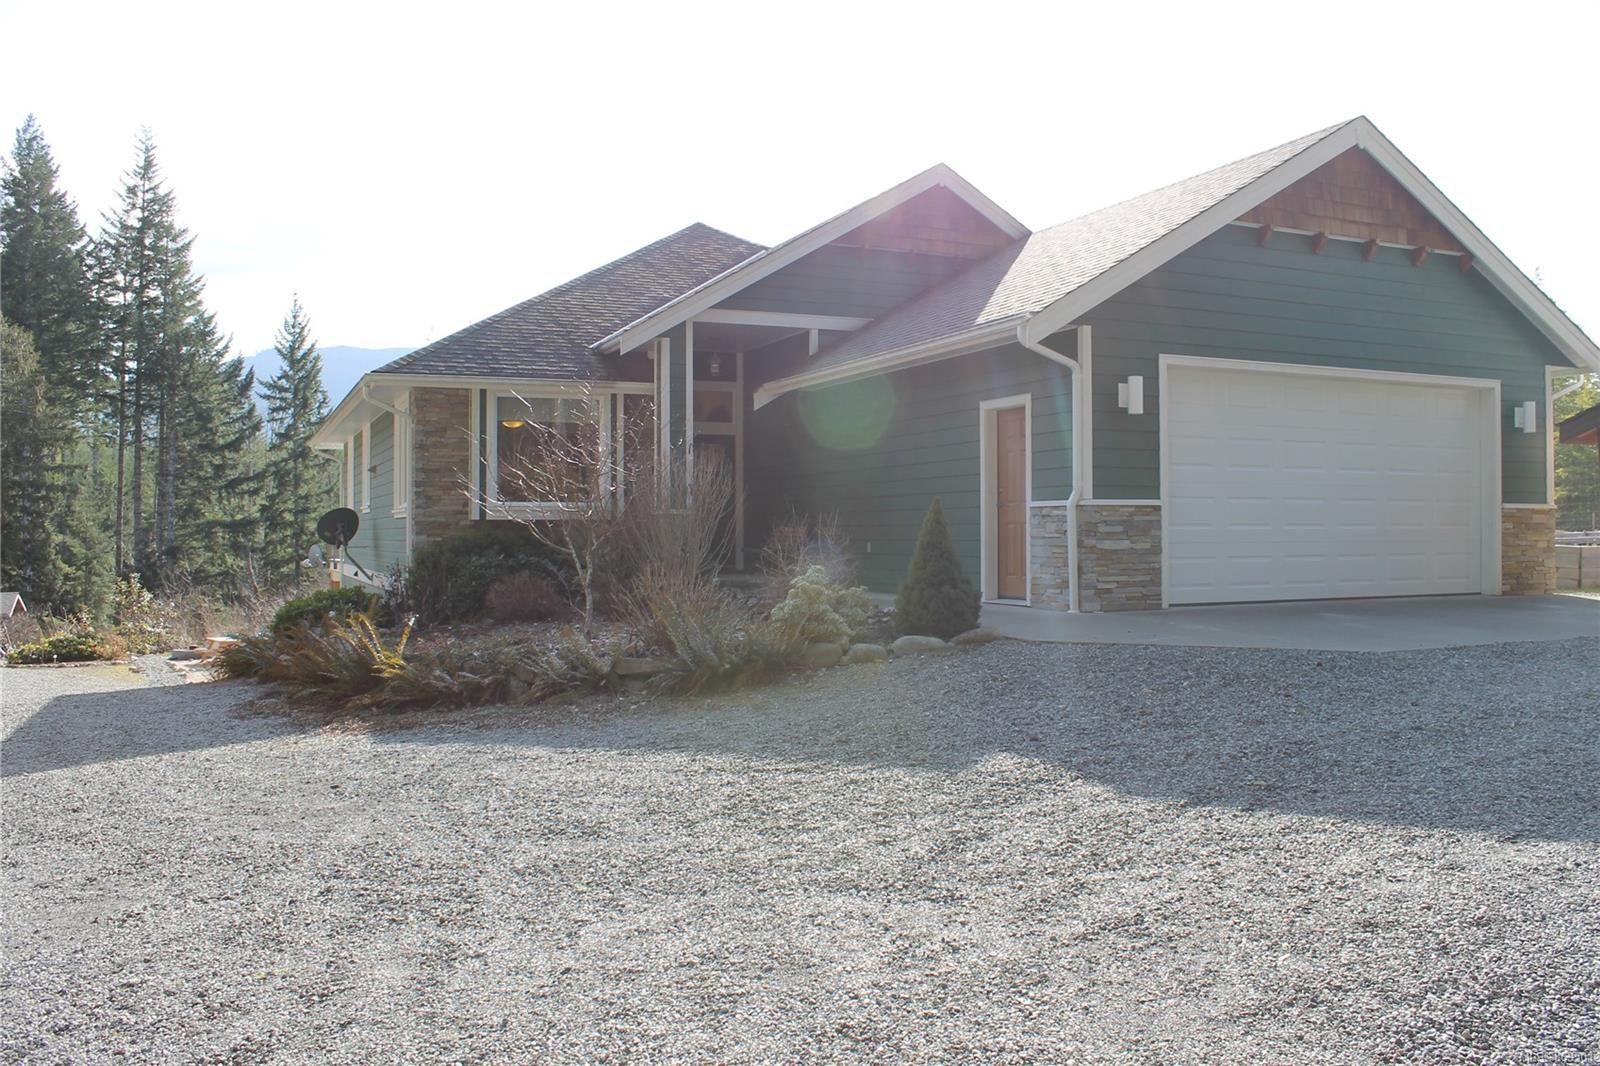 Main Photo: 5160 Cowichan Lake Rd in : Du West Duncan House for sale (Duncan)  : MLS®# 869501